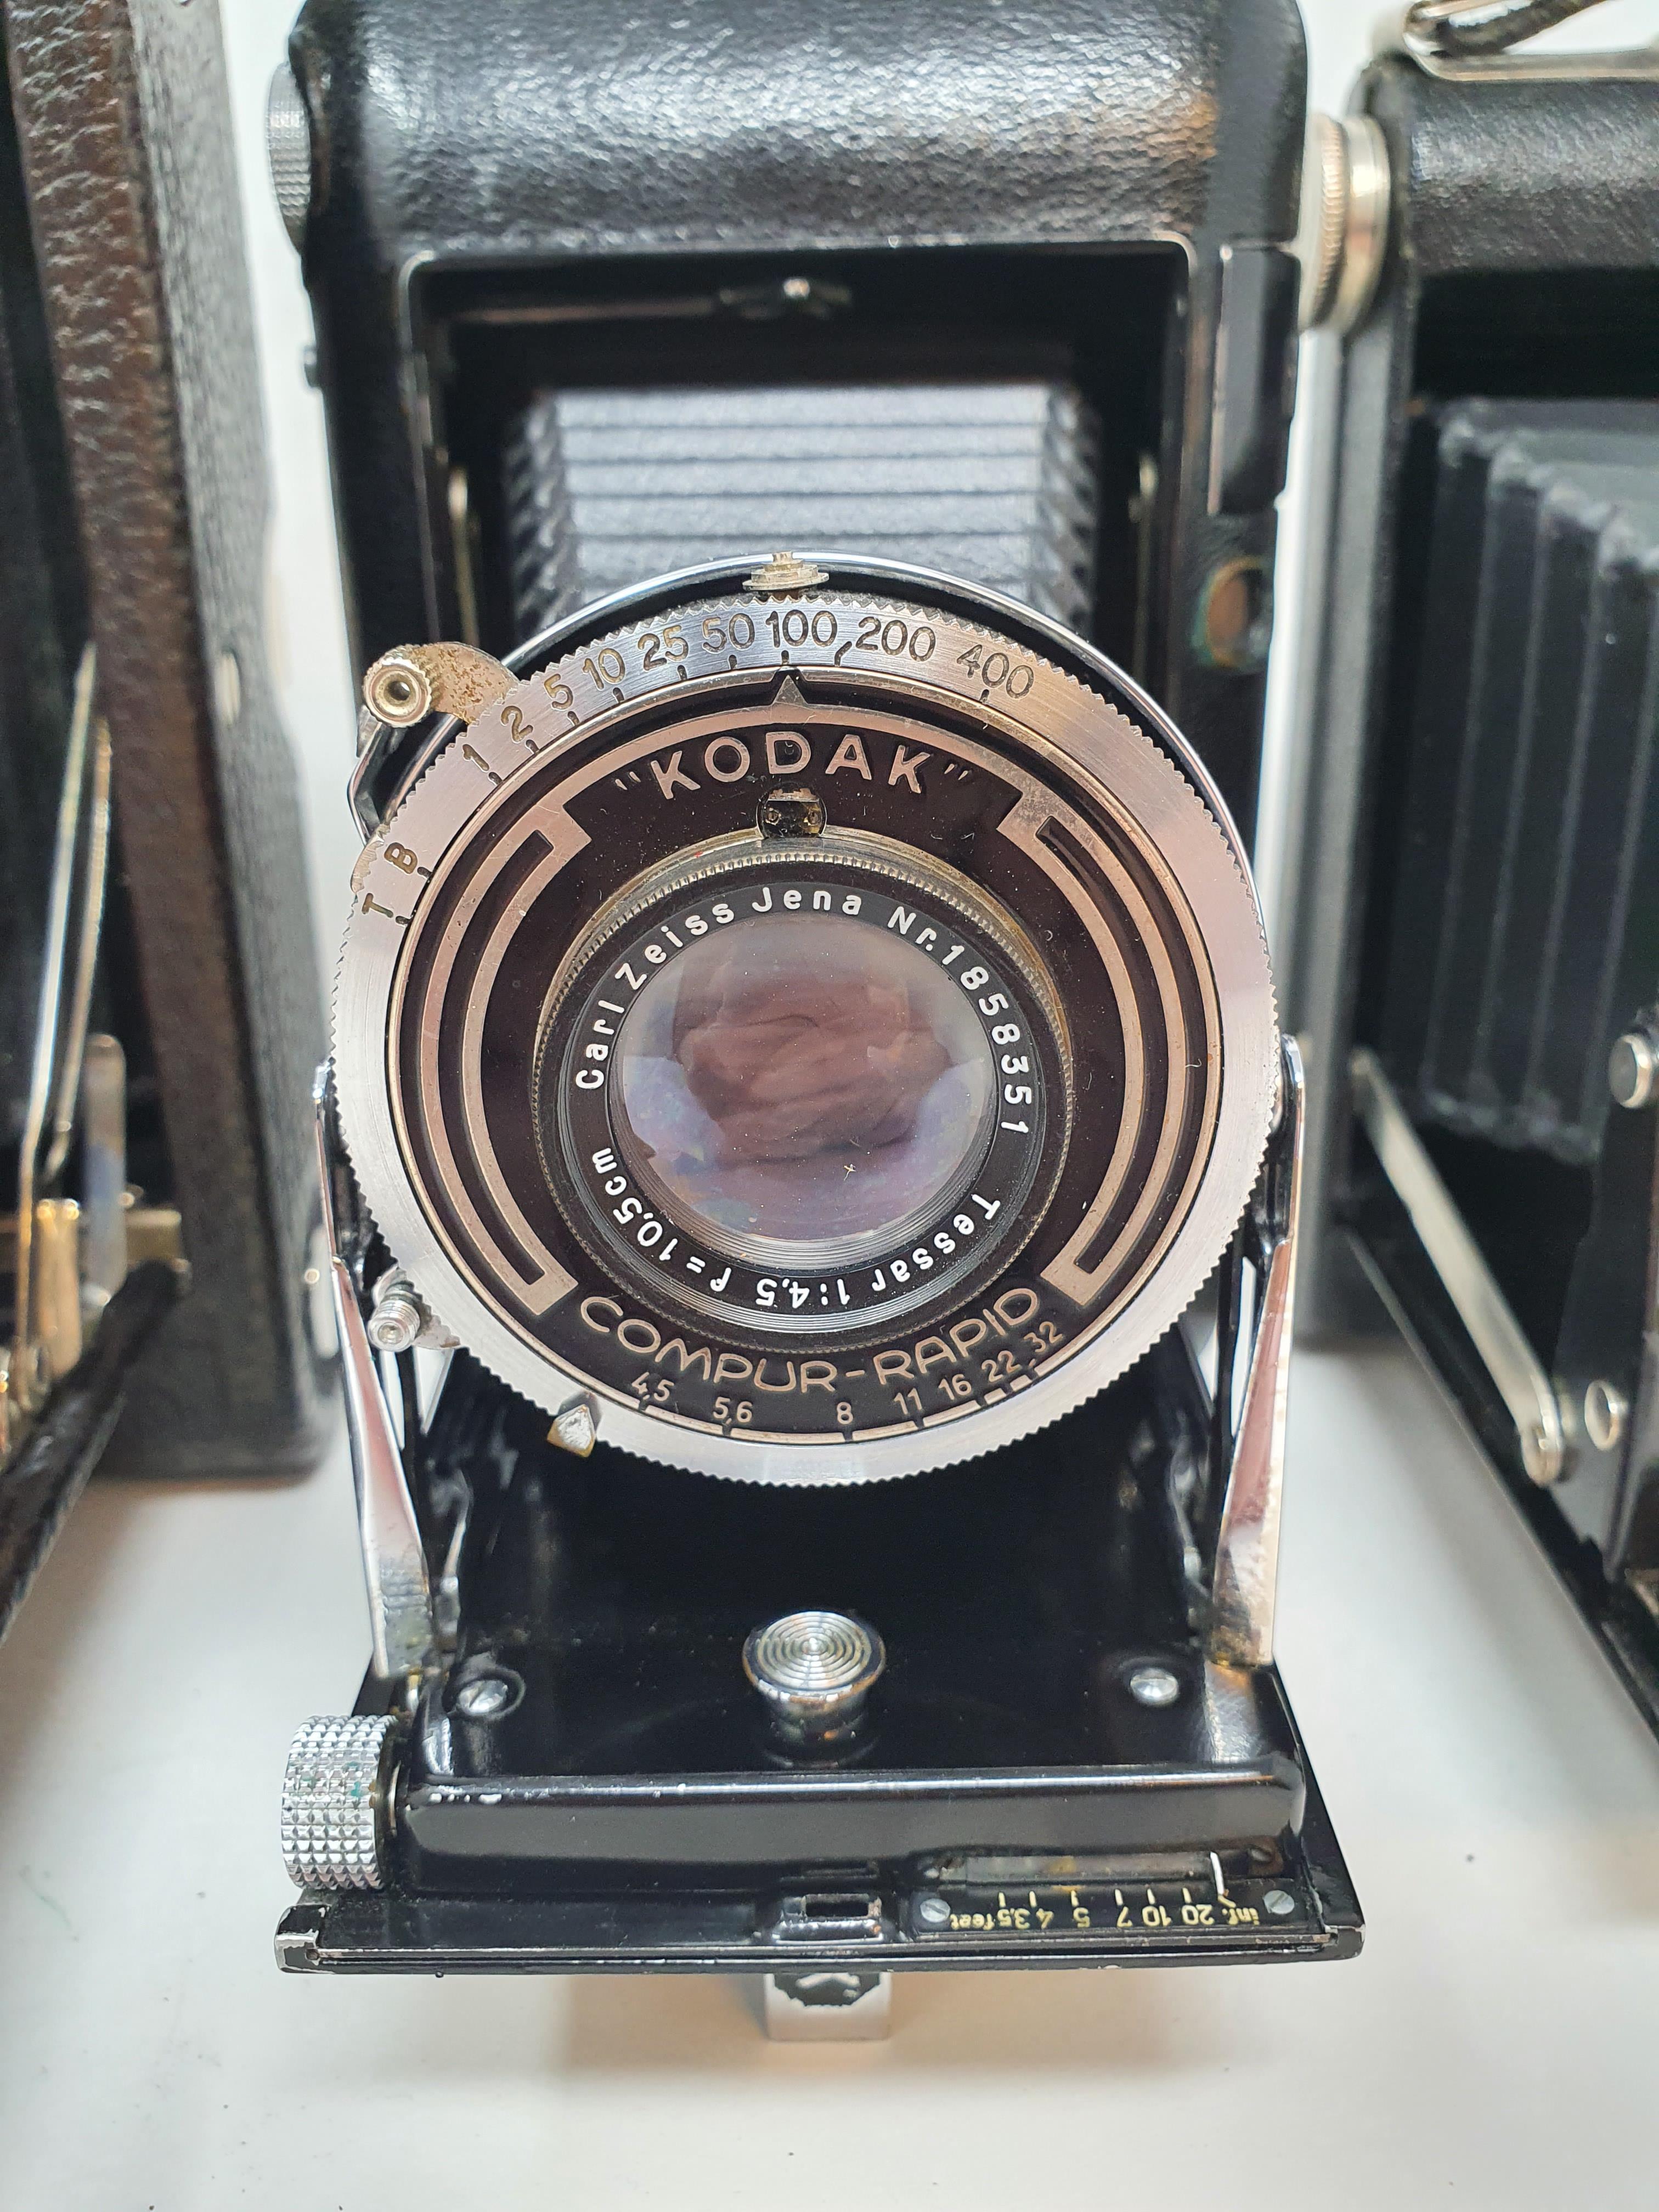 A Kodak Regent folding camera, with leather outer case, a Kodak folding camera, with leather outer - Image 3 of 6